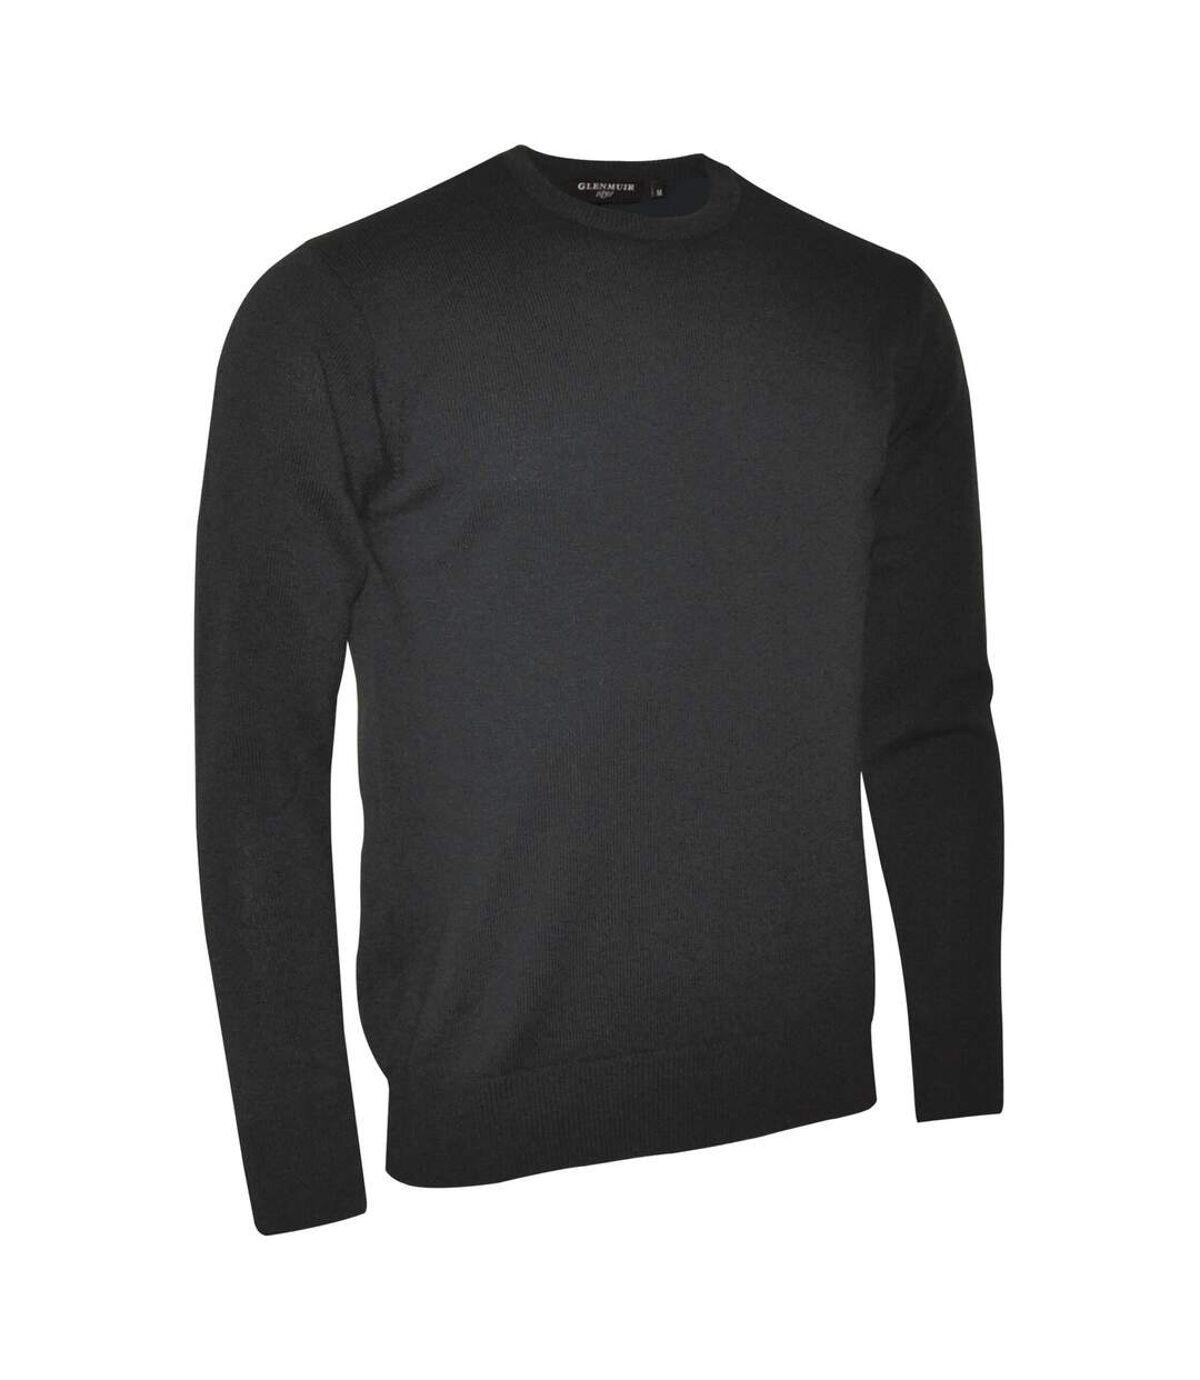 Glenmuir Morar Mens Crew Neck Sweater (Bordeaux) - UTRW516